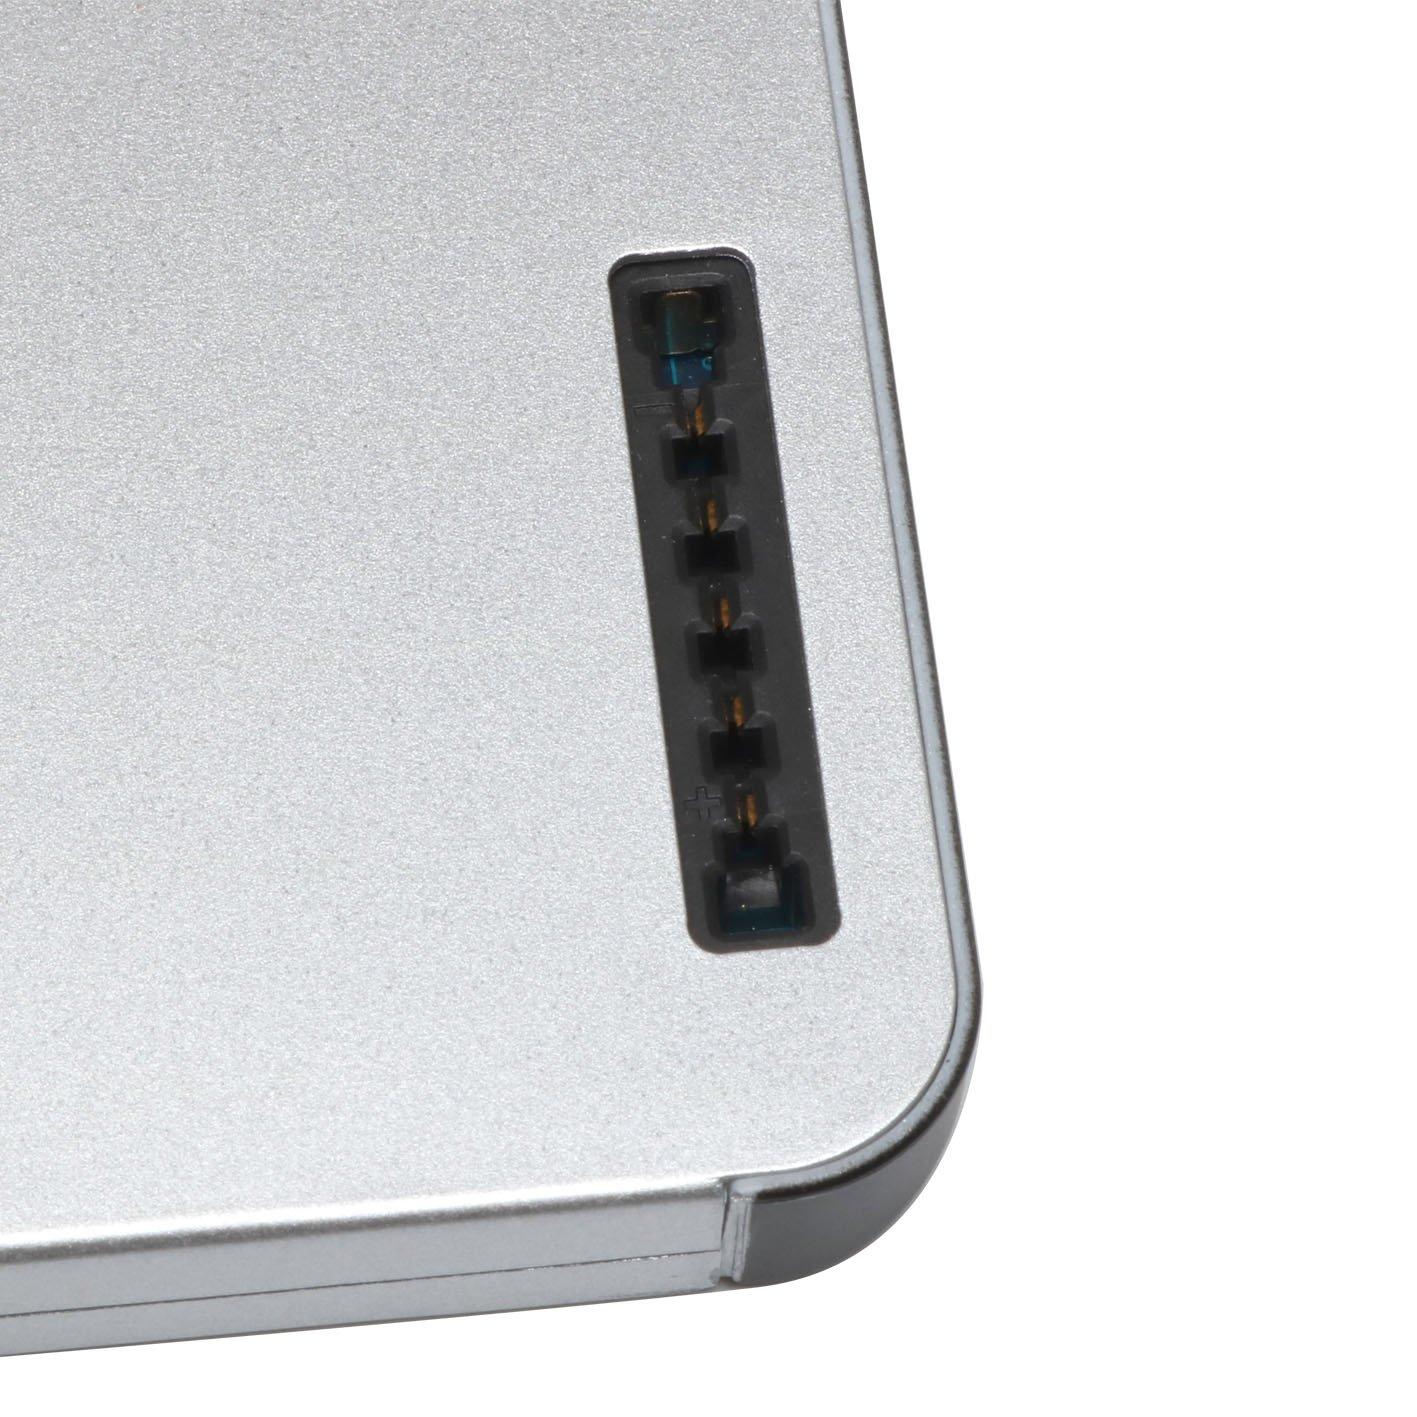 MB466LL//A Aluminum Unibody MB467LL//A Elecbrain/® 45WH Laptop Battery for Apple A1278 A1280 Macbook 13-Inch Late 2008 Aluminum Version